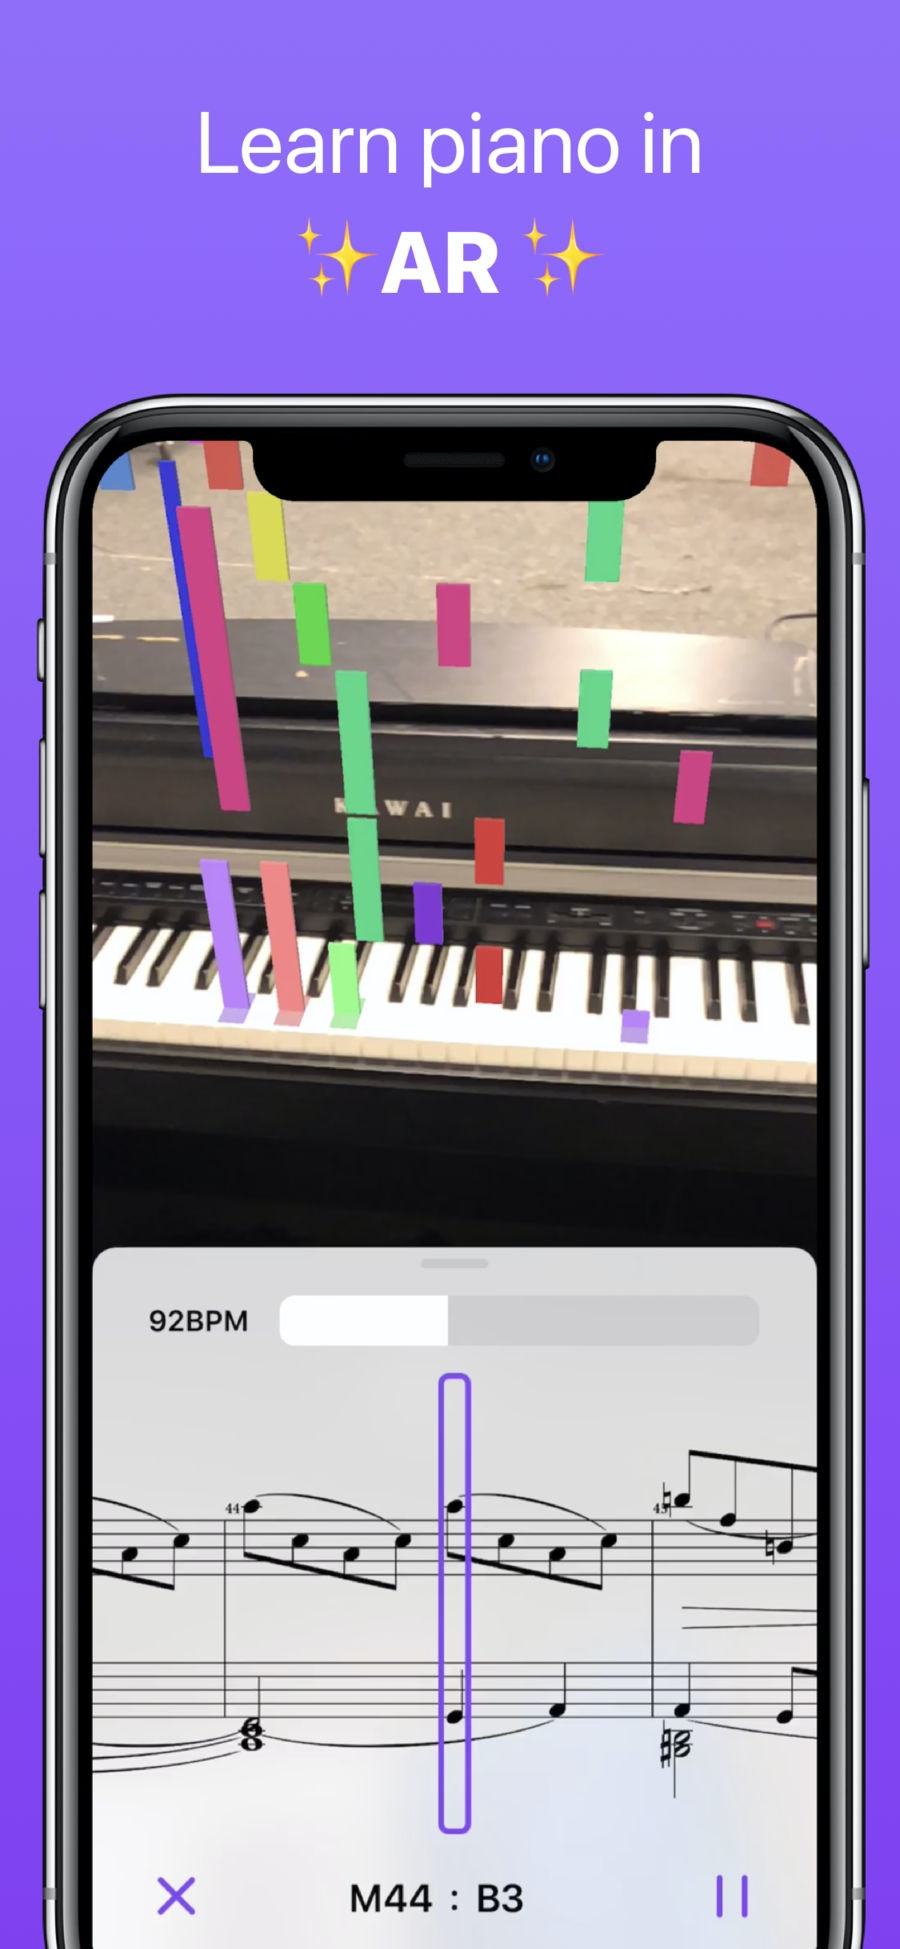 Chroma - Learn piano with AR ✨